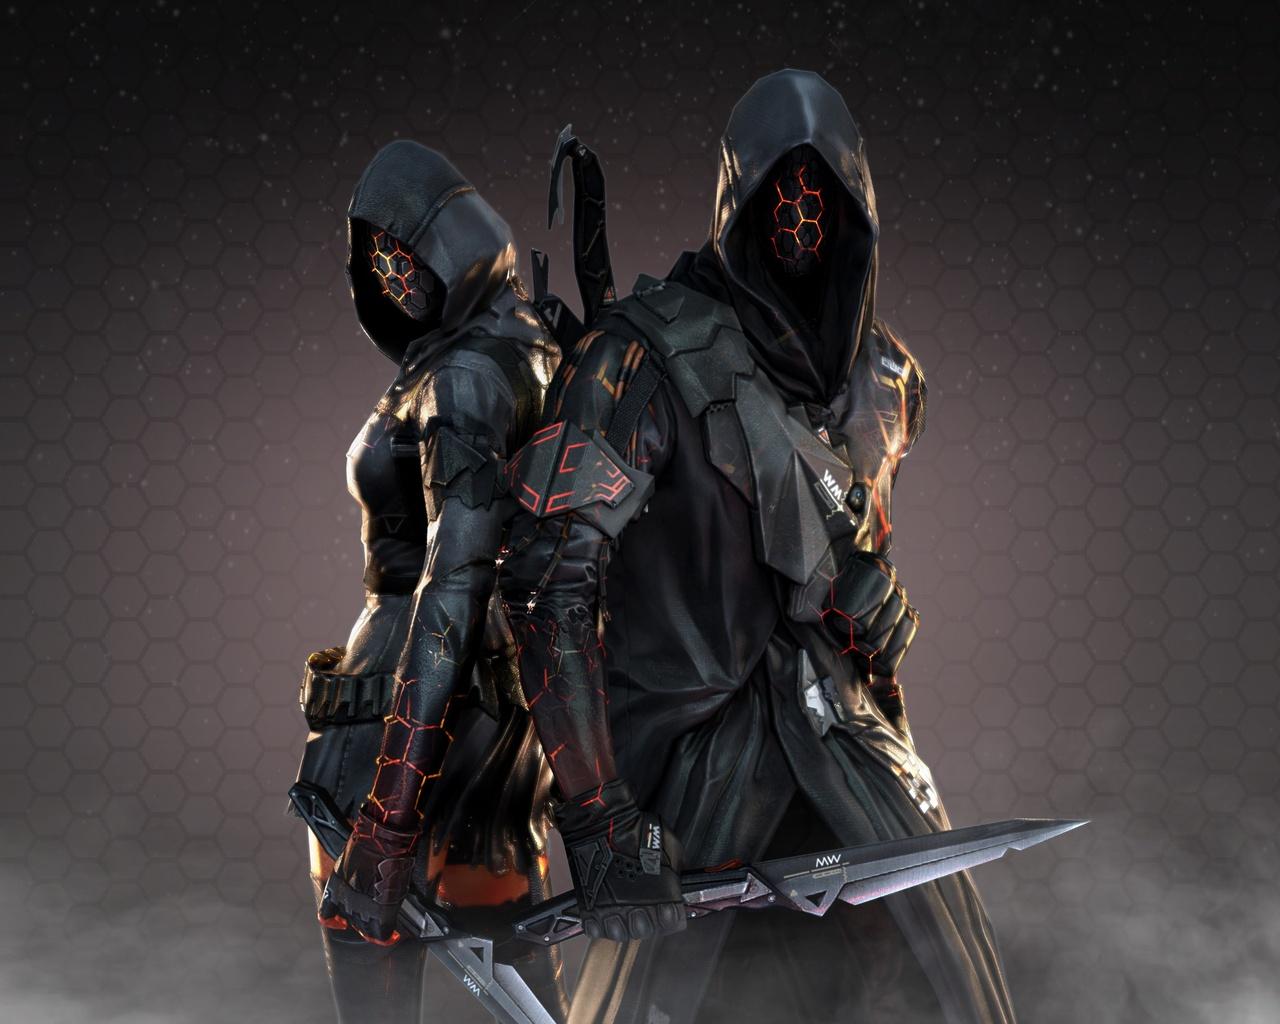 crossfire-online-game-k6-1280x1024.jpg